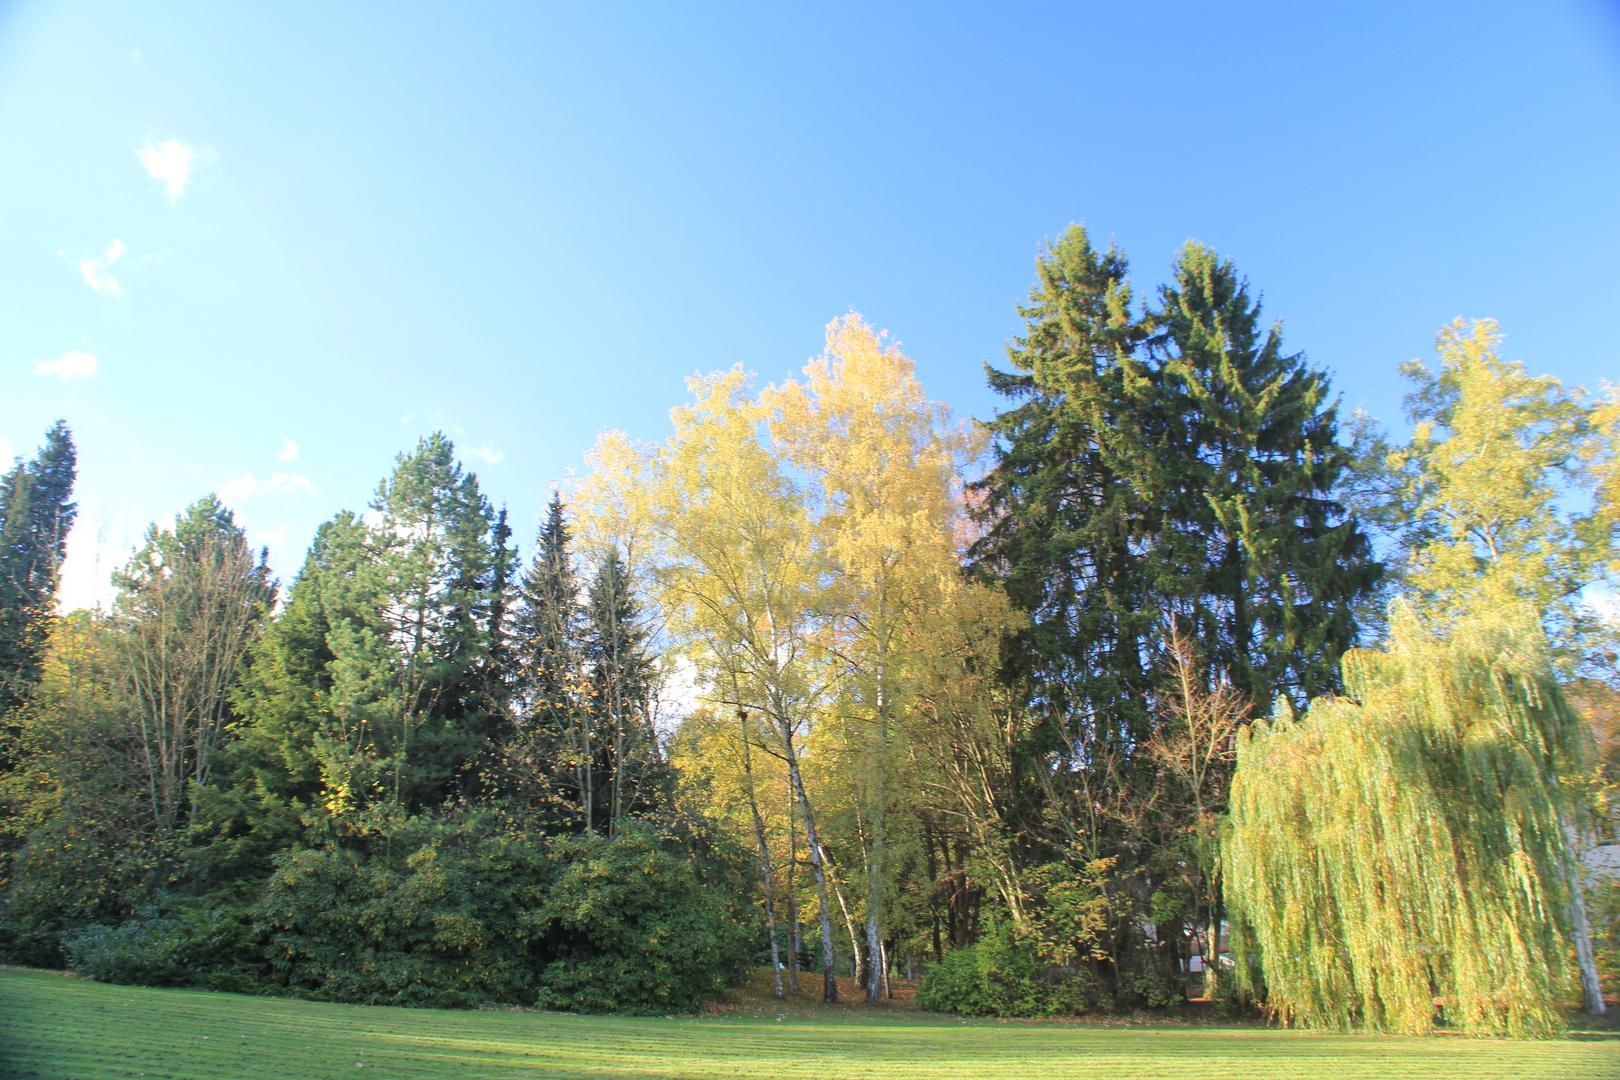 Herbst im Rehbergpark Herborn